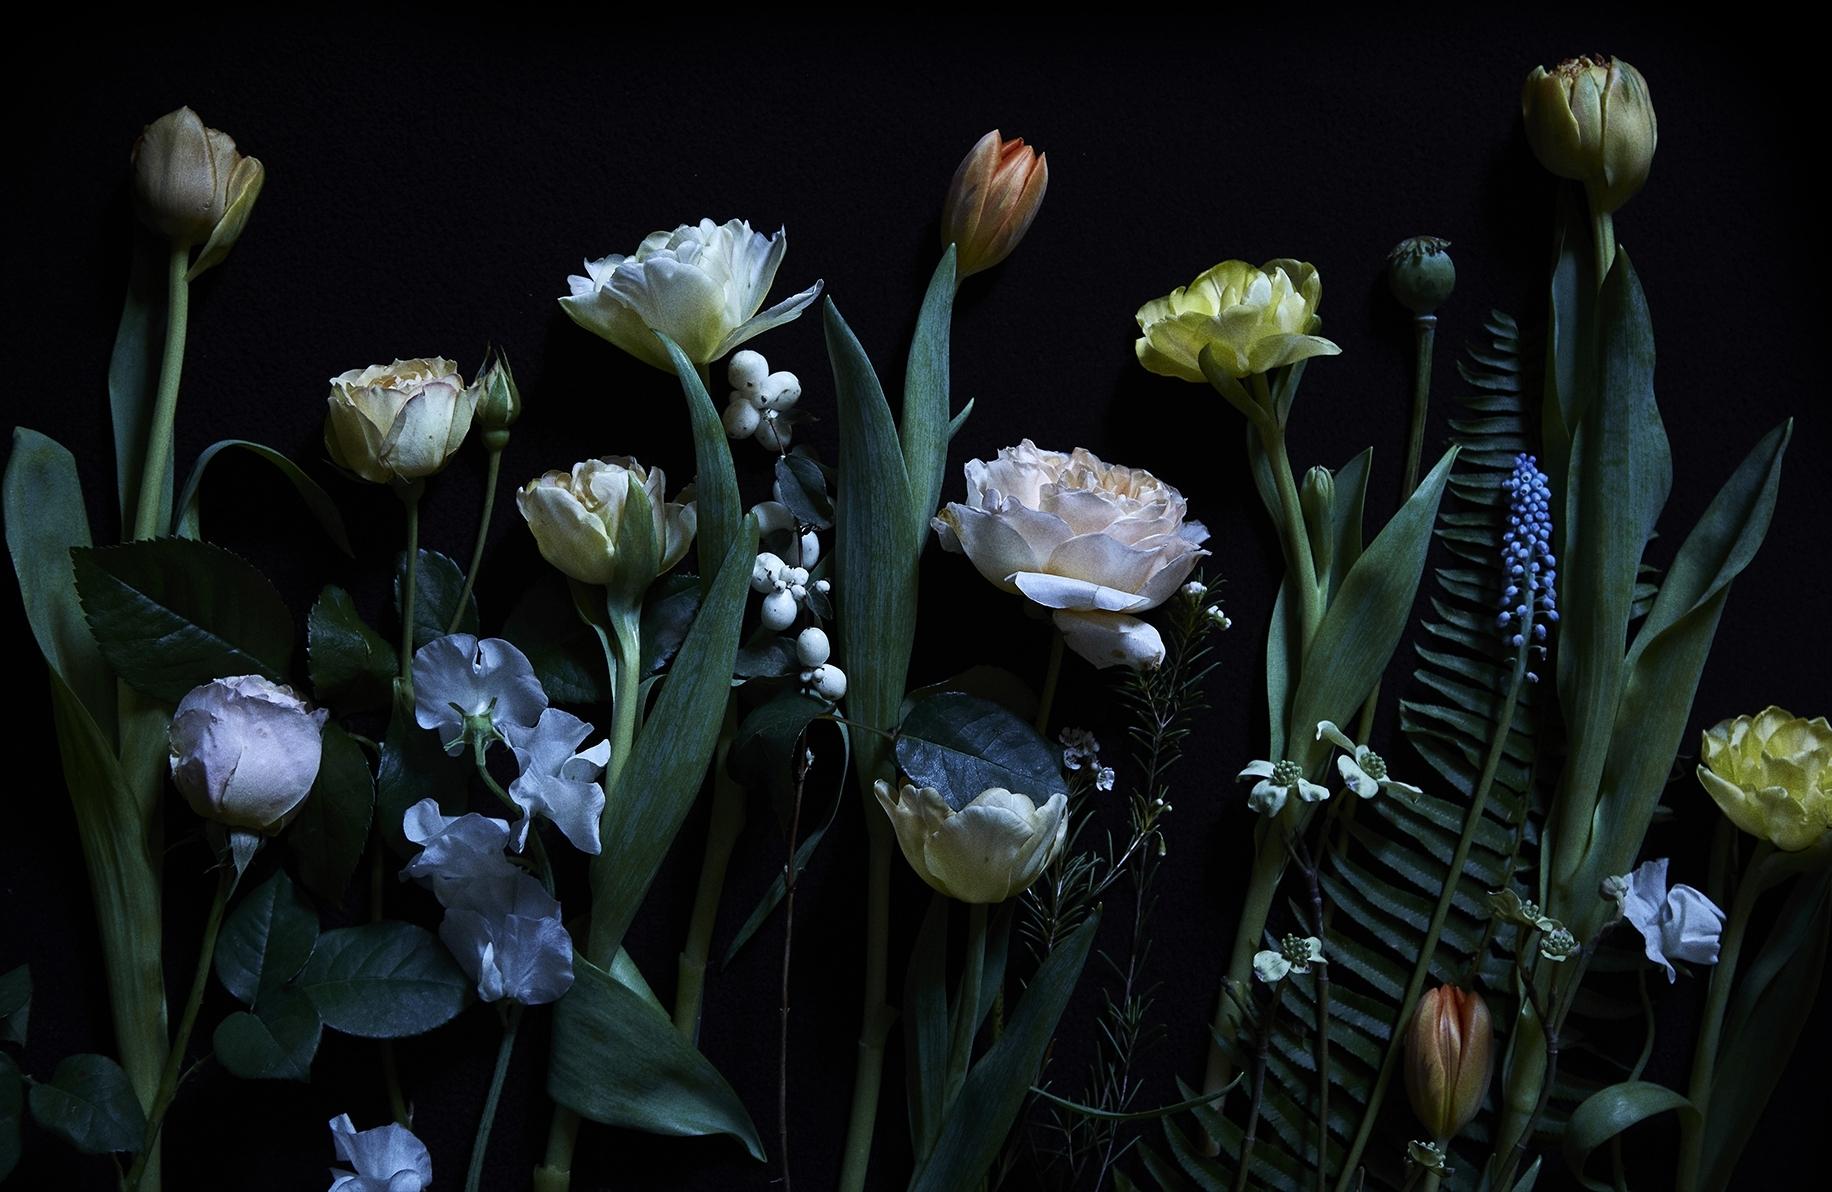 flowers_day26908.jpg